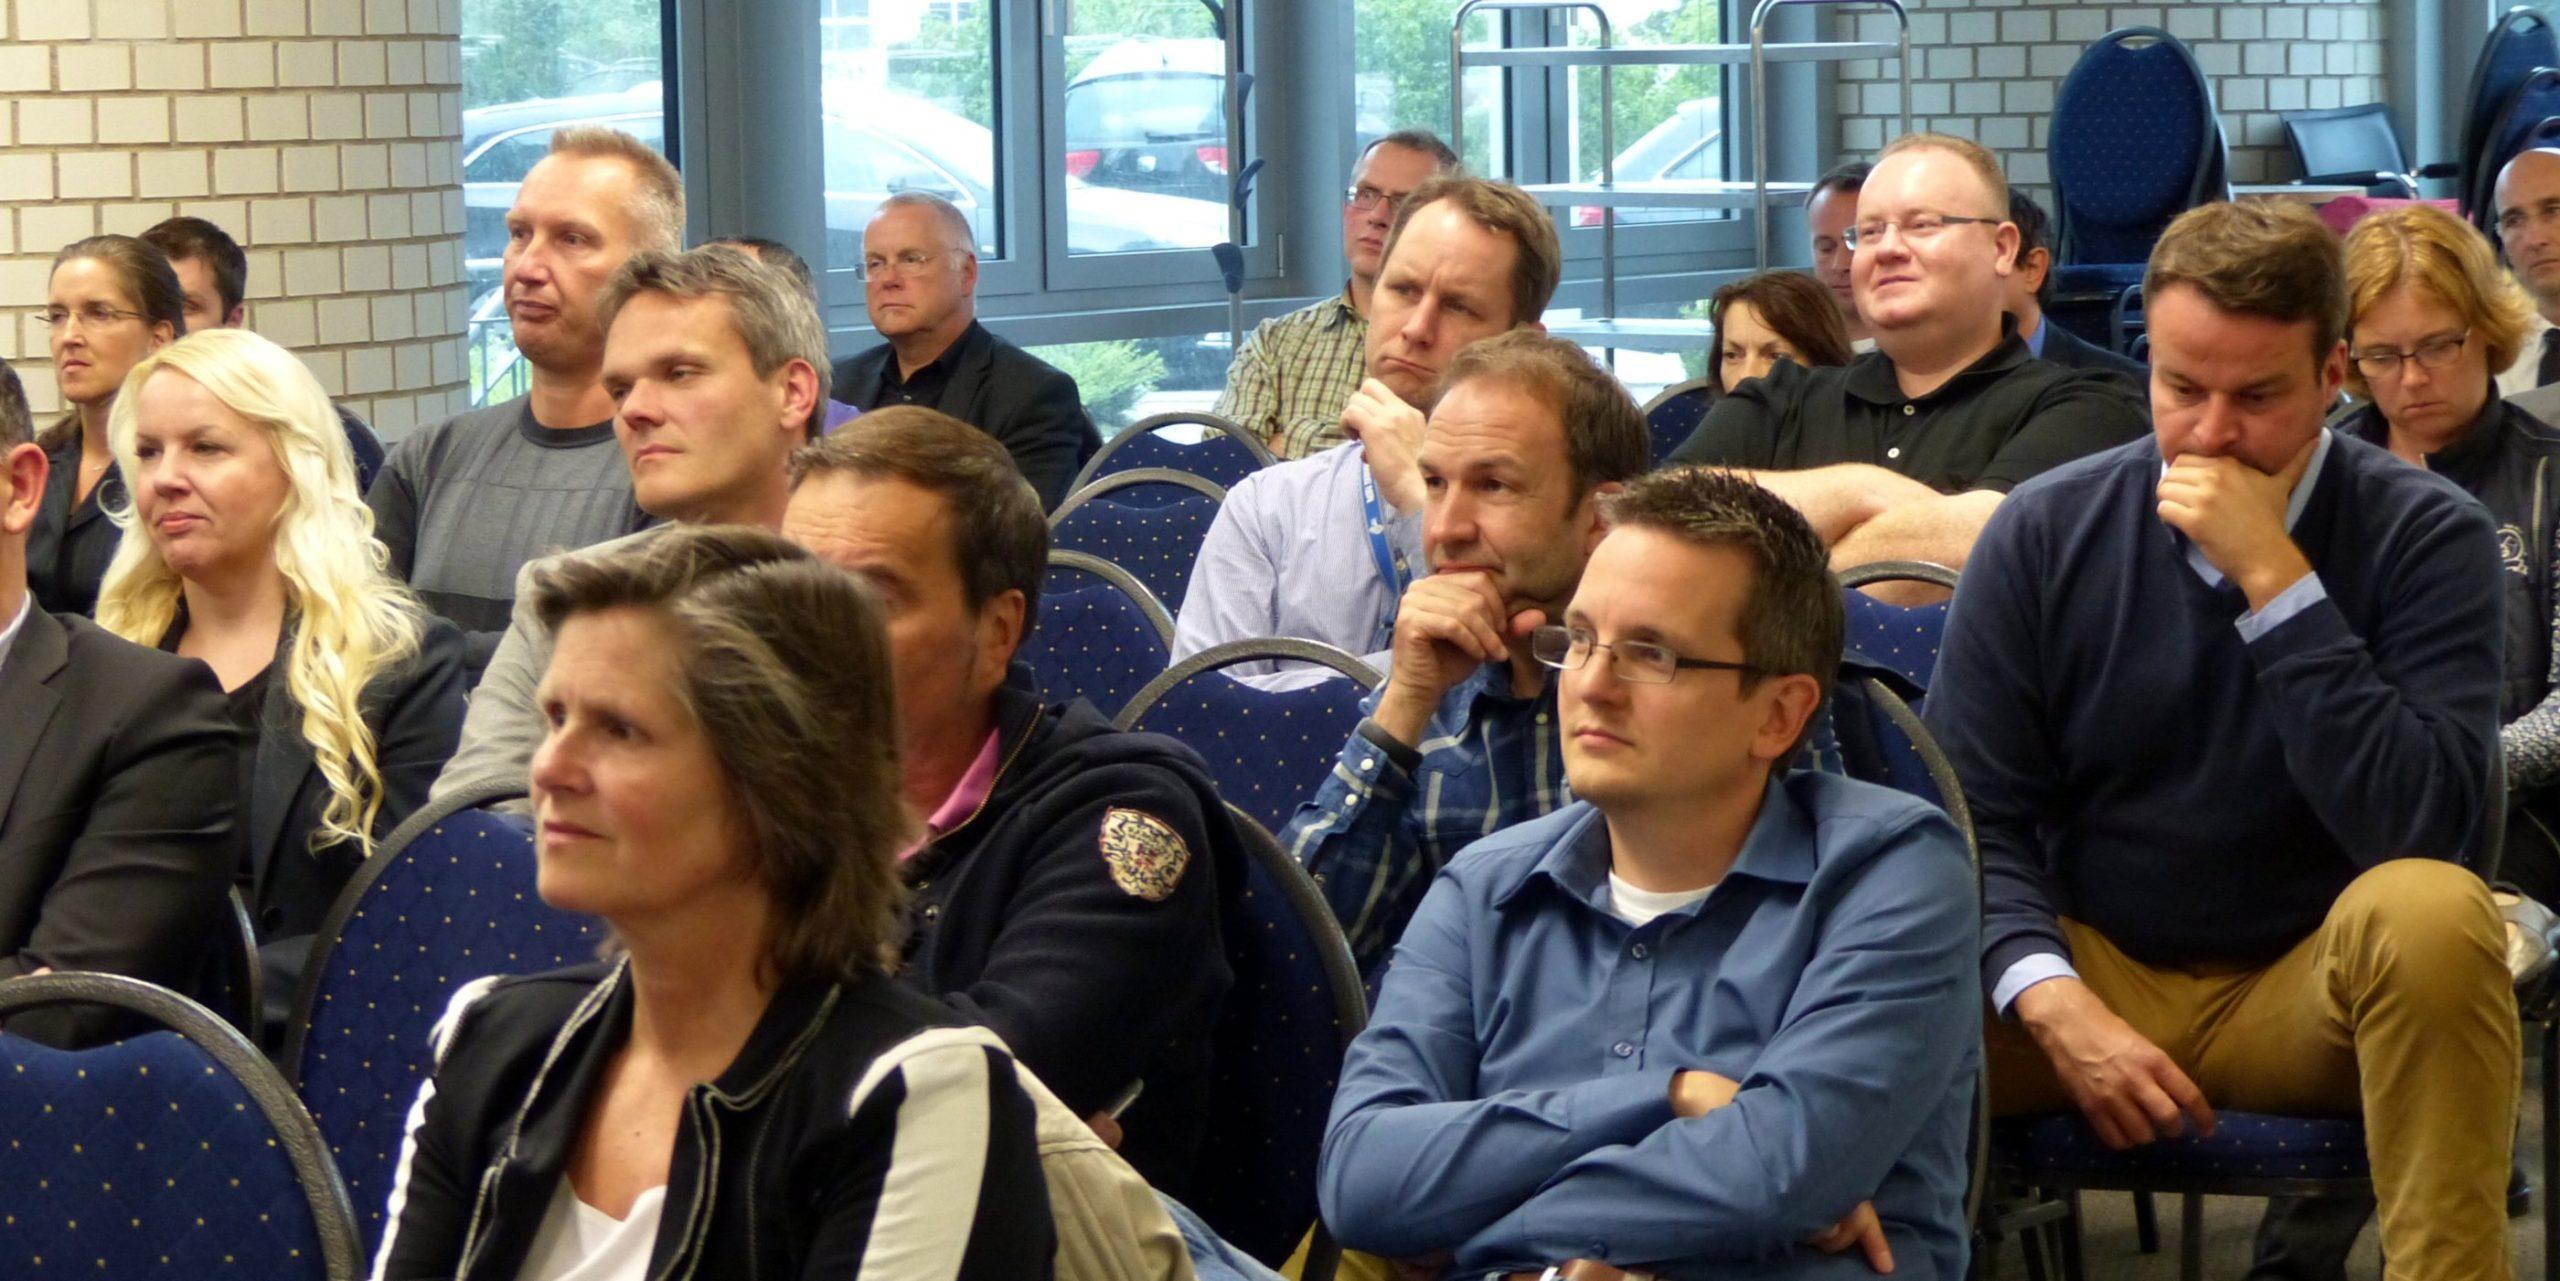 Rückblick Chaptermeeting vom 22.06.2015 im ABC Tower in Köln-Porz